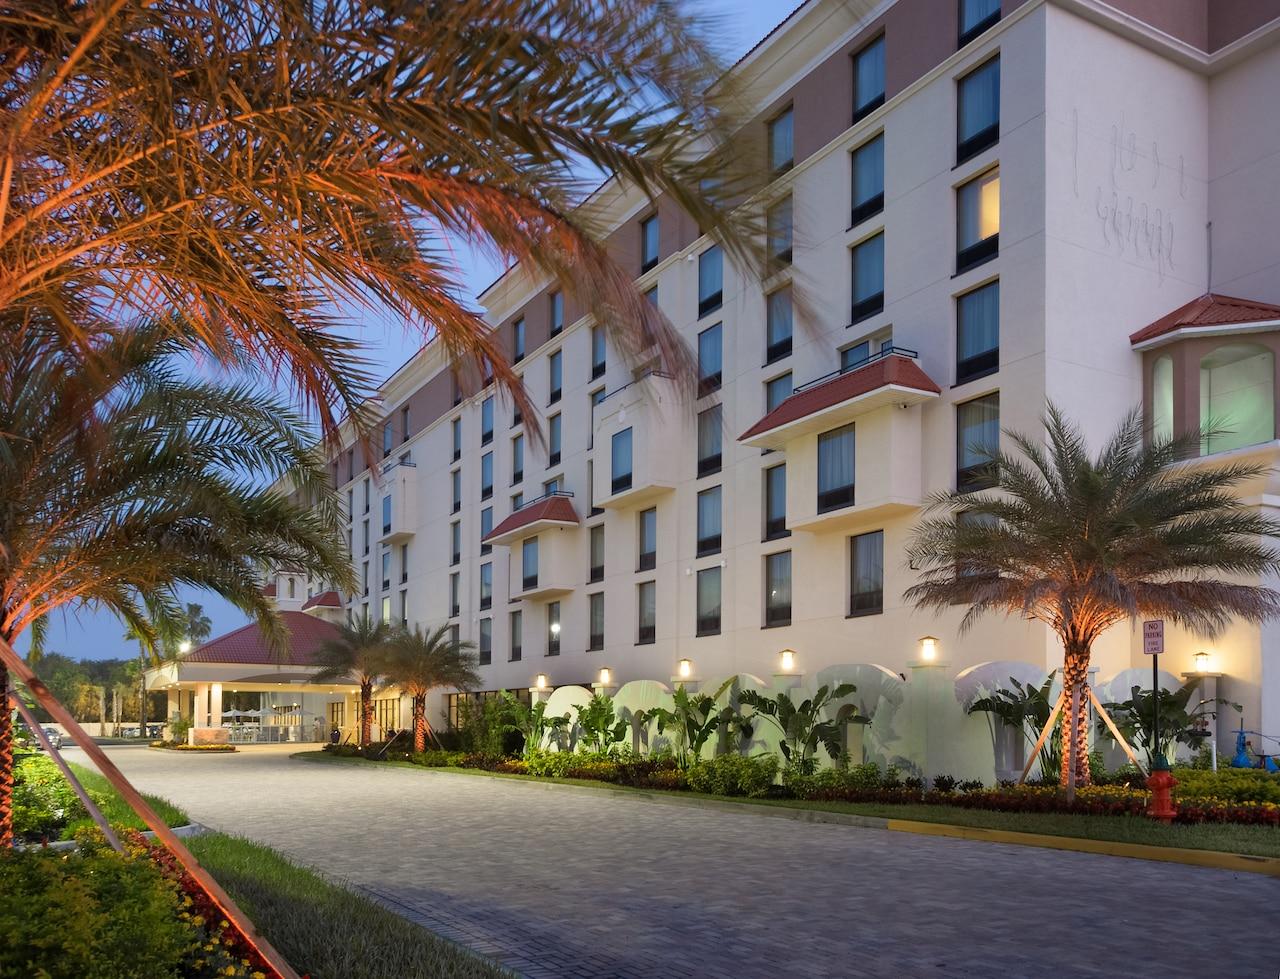 The 7 story exterior of the Delta Orlando Lake Buena Vista hotel